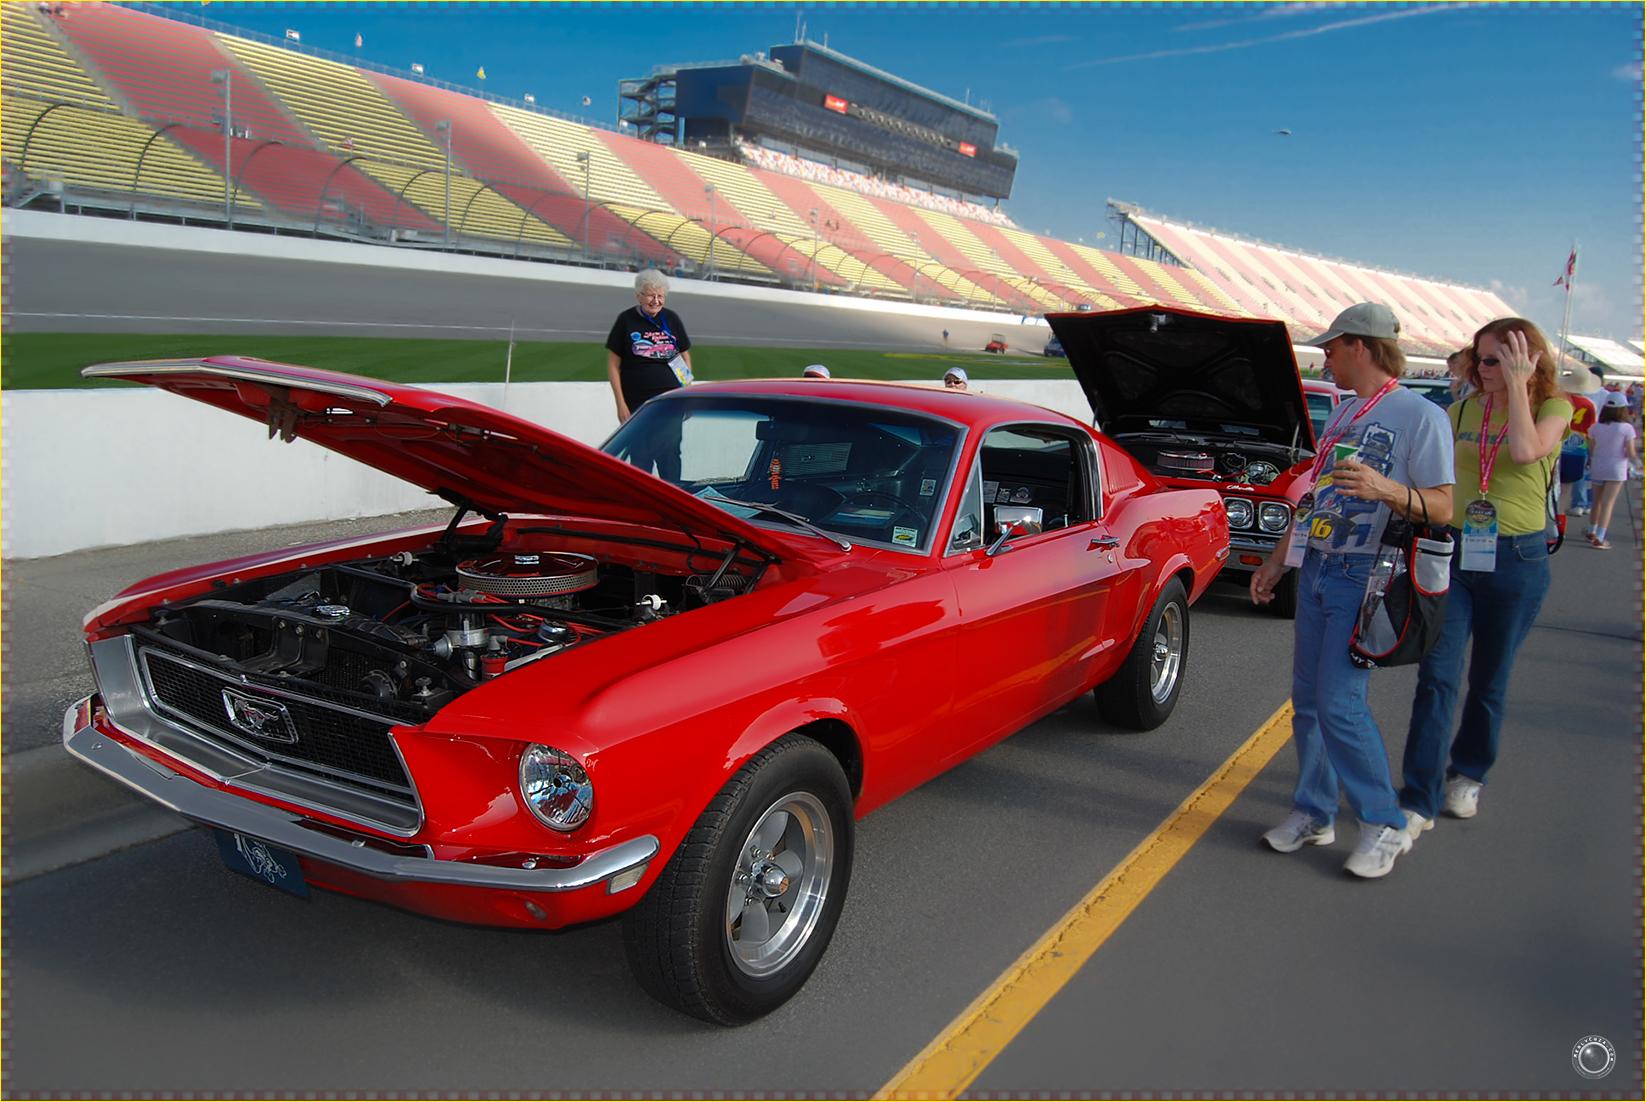 44 Mustang Sally